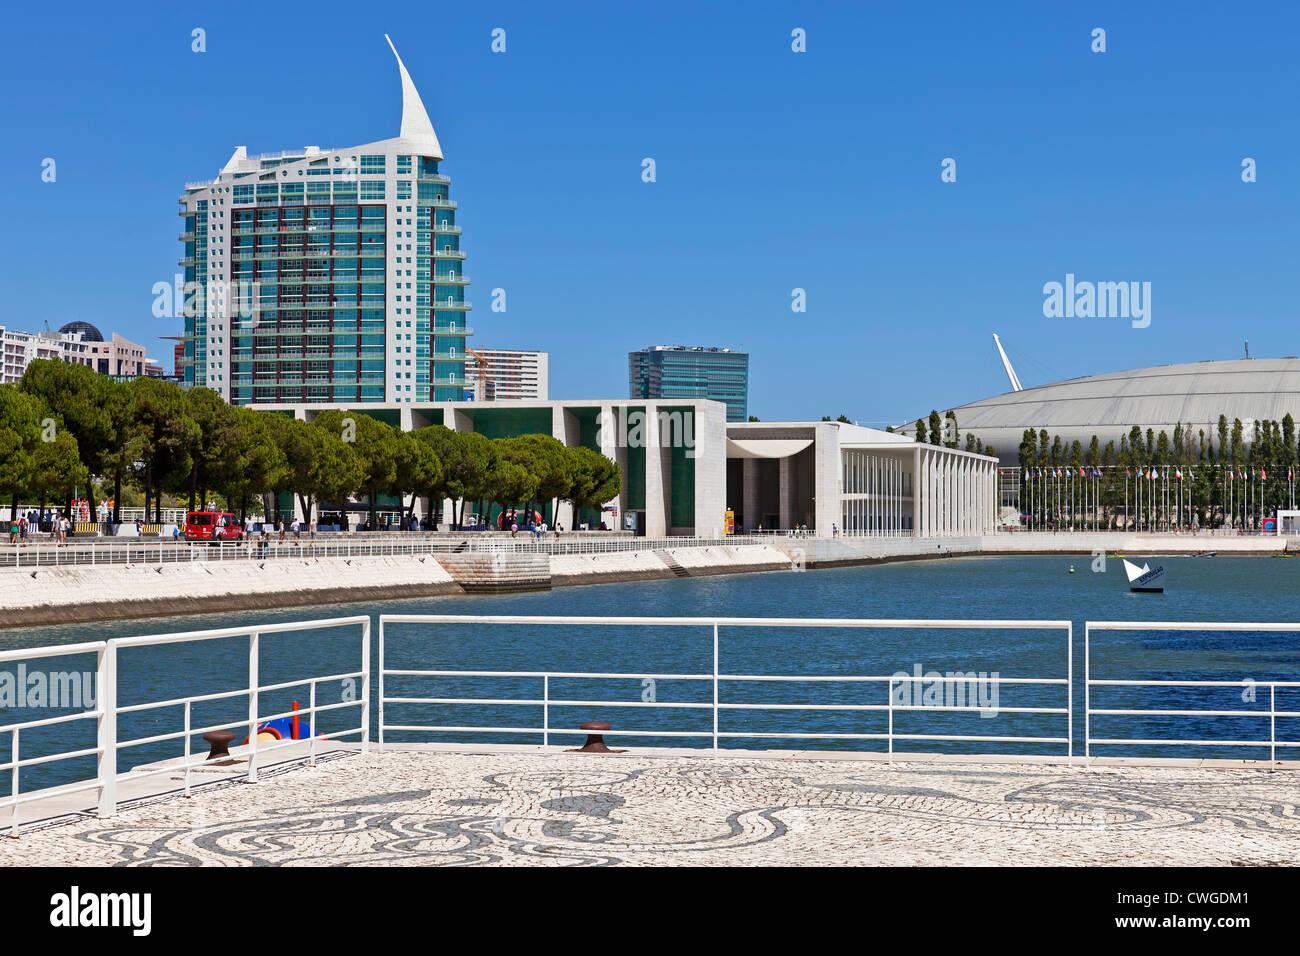 Portugiesischer Pavillon, Sao Rafael Turm, Atlantico Pavilion und Olivais Dock. Parque Das Nações, Lissabon, Stockbild